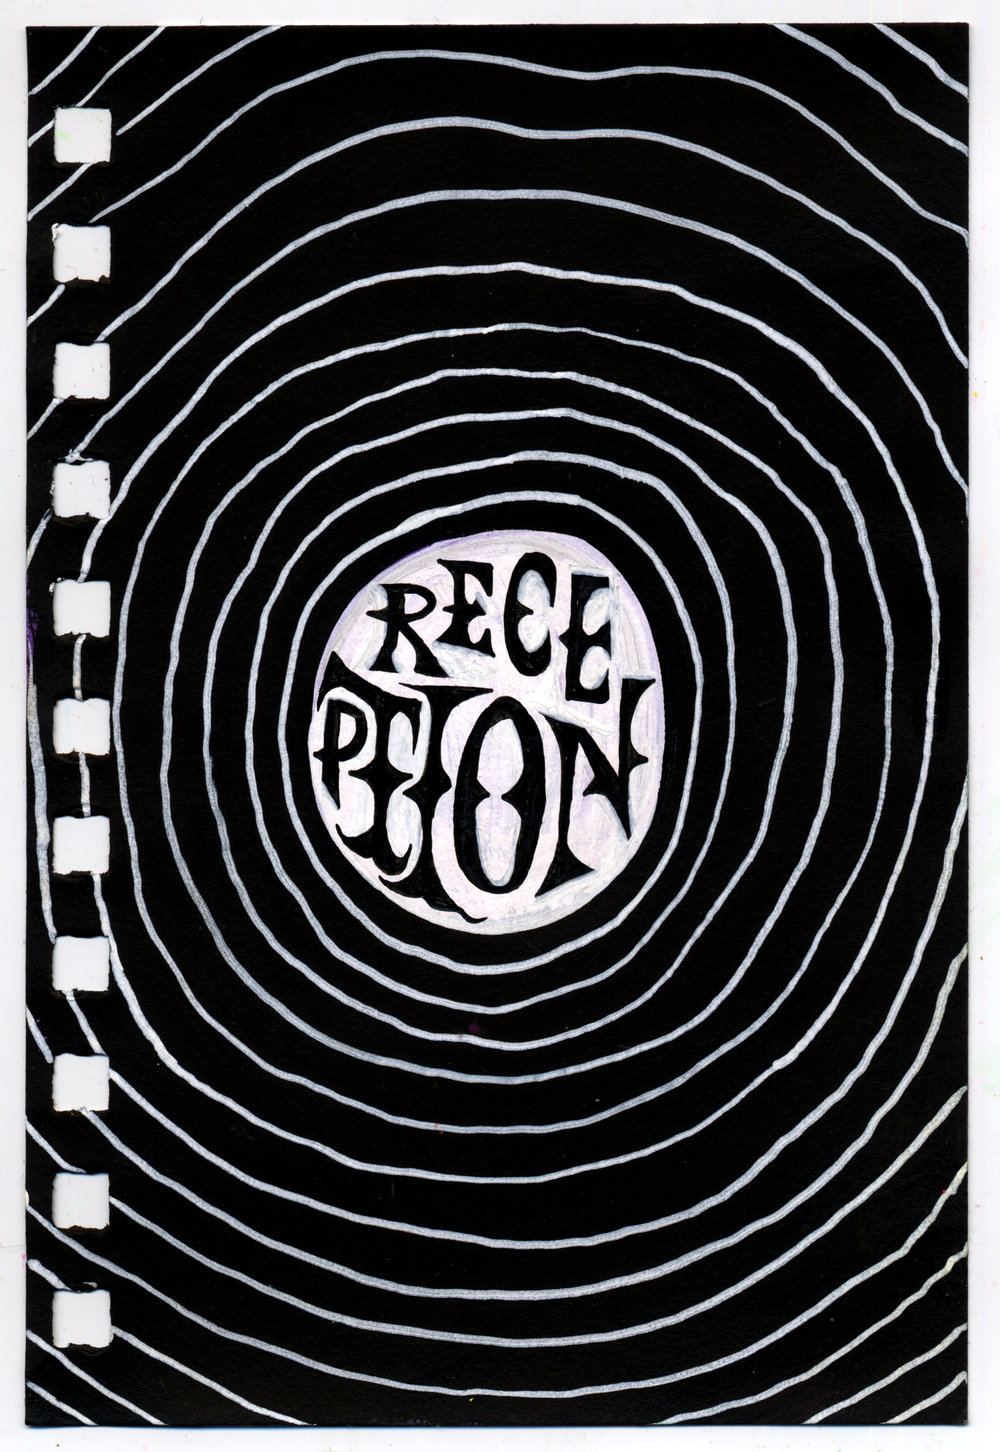 Reception (Circle)